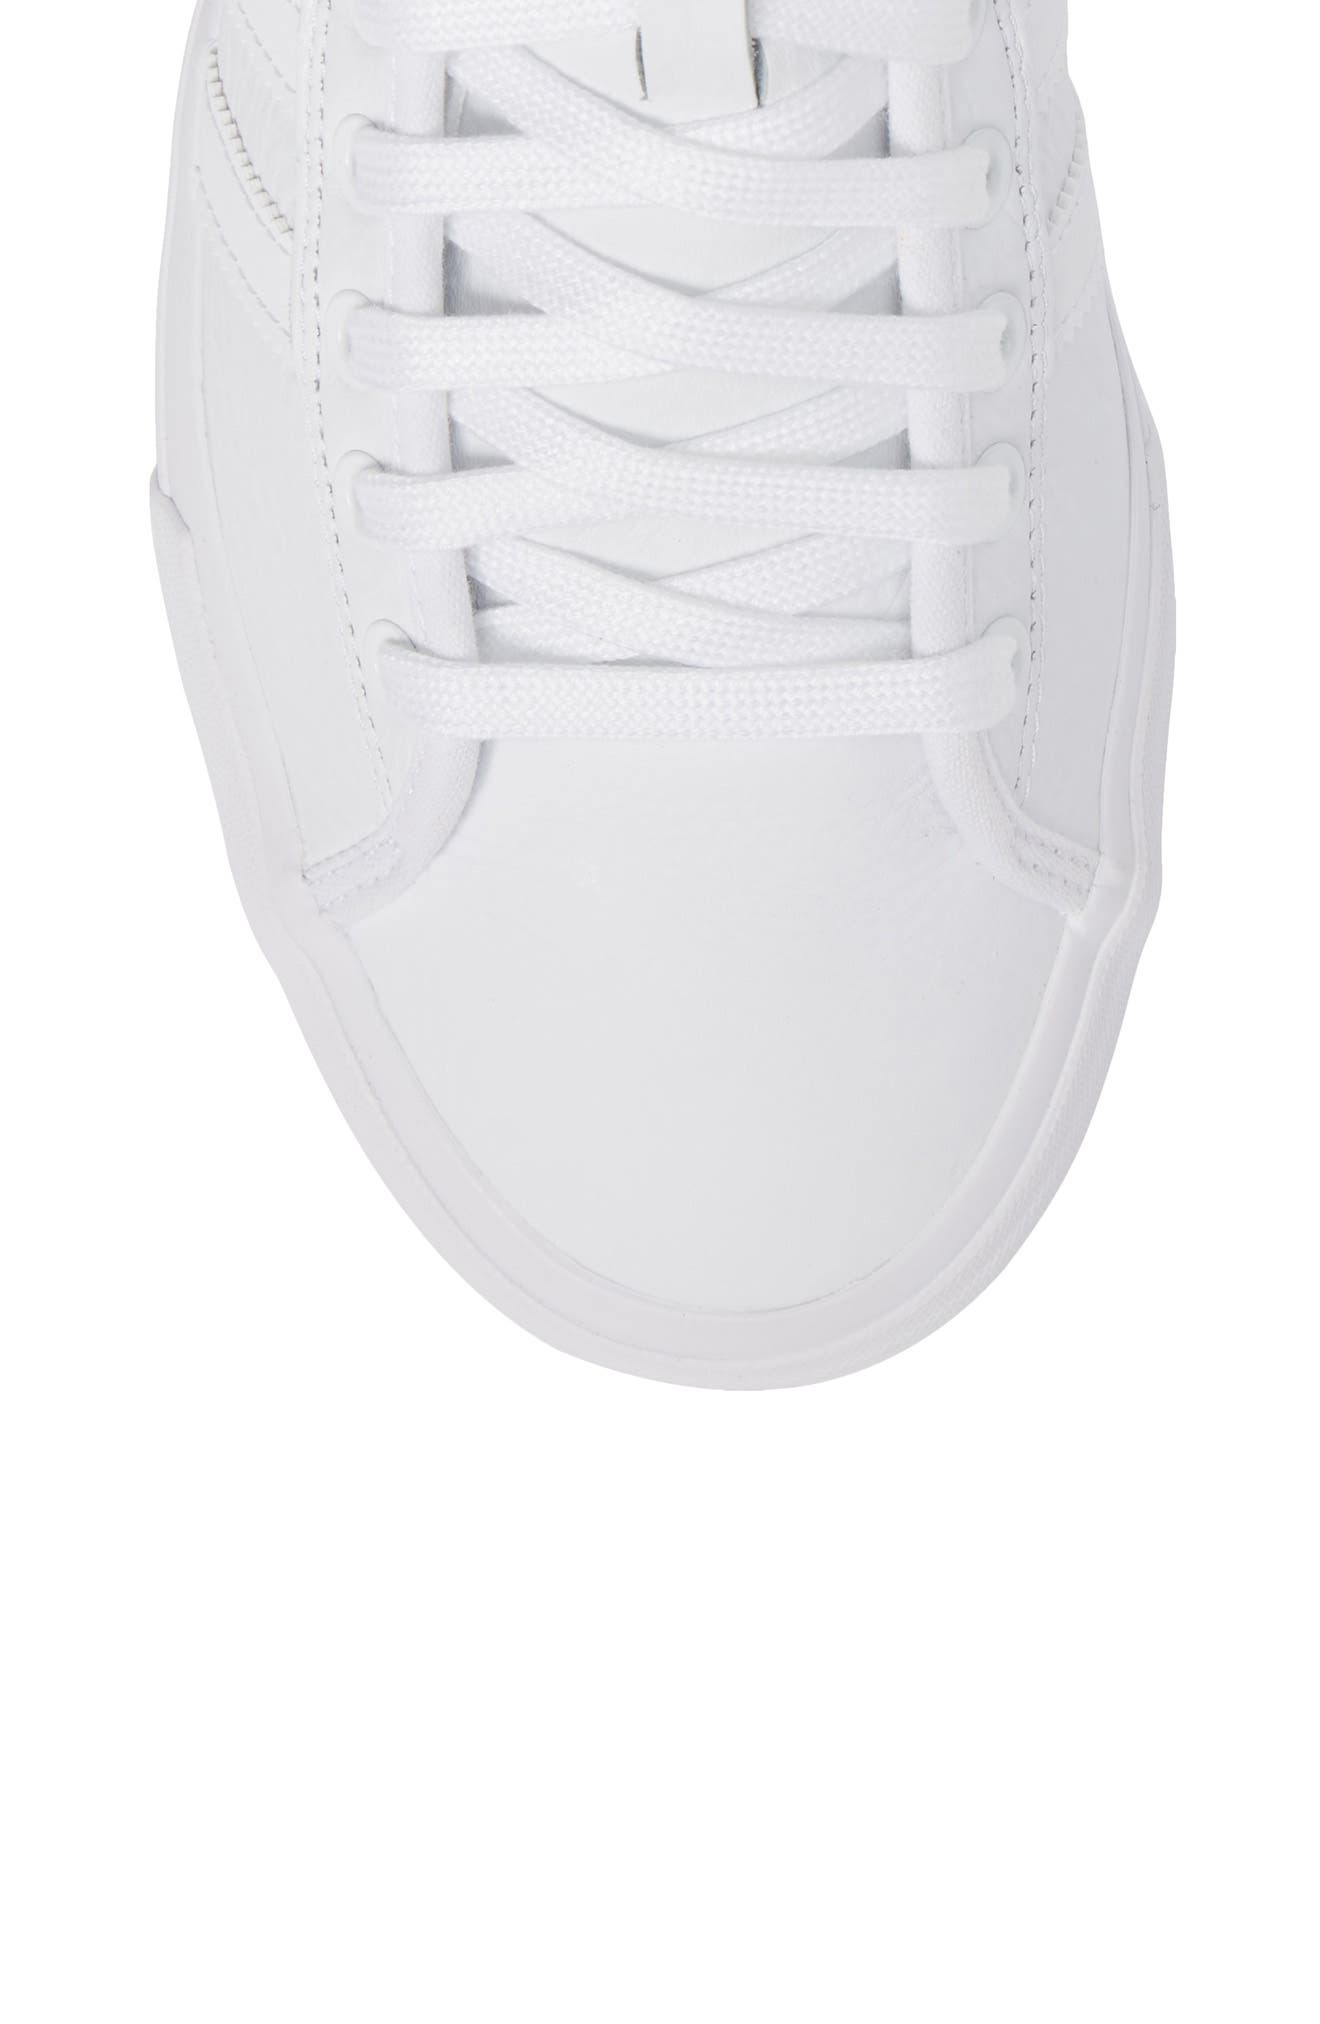 Matchcourt High Top Sneaker,                             Alternate thumbnail 5, color,                             White/ White/ White